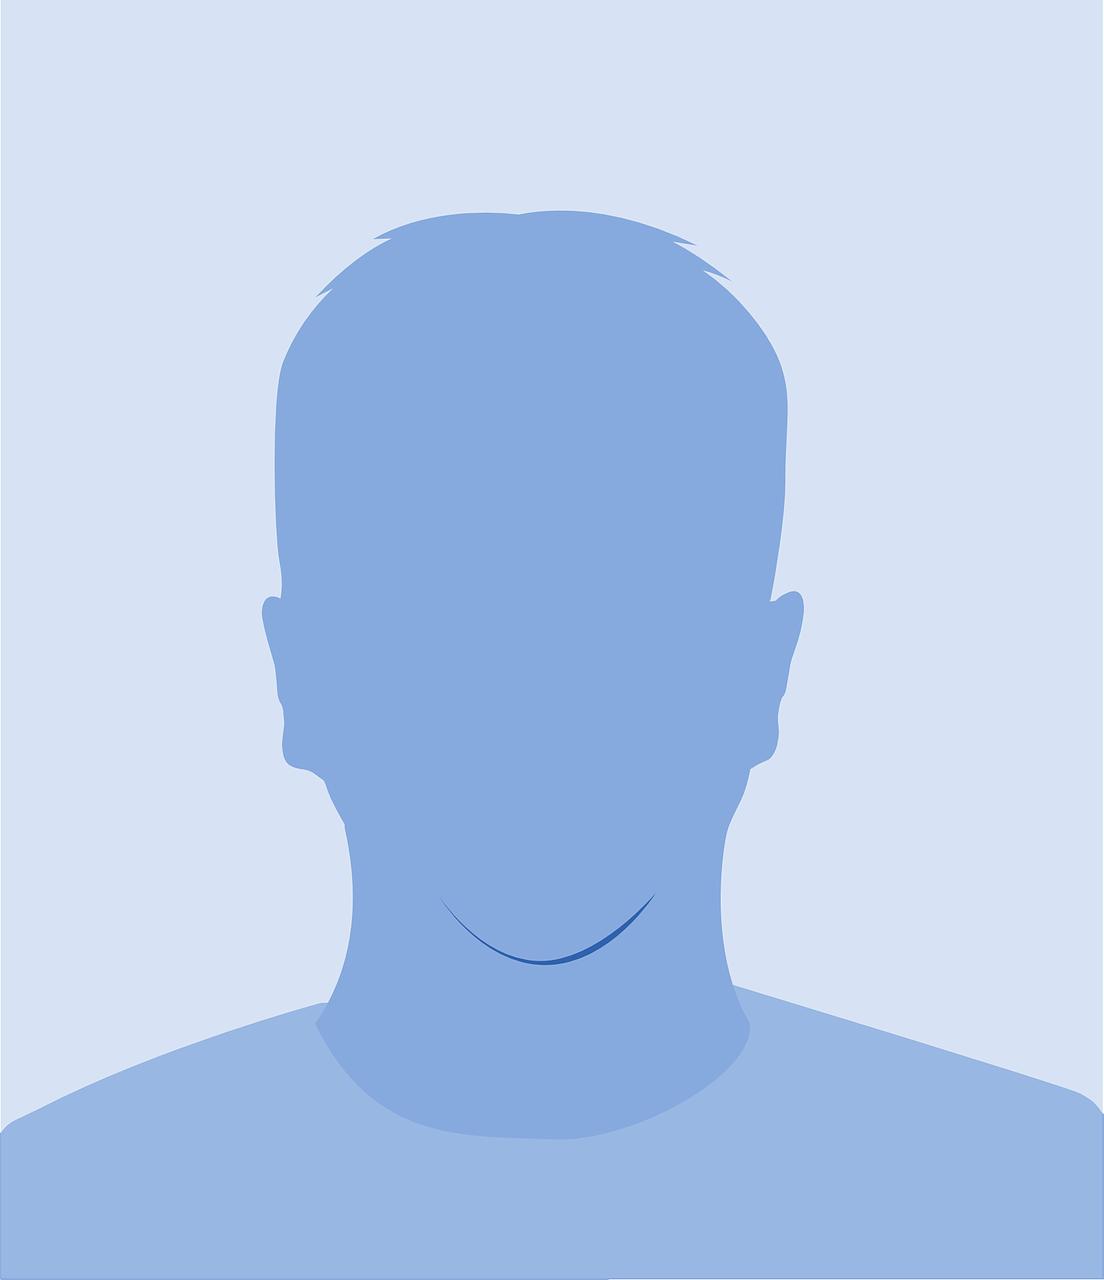 generic man picture